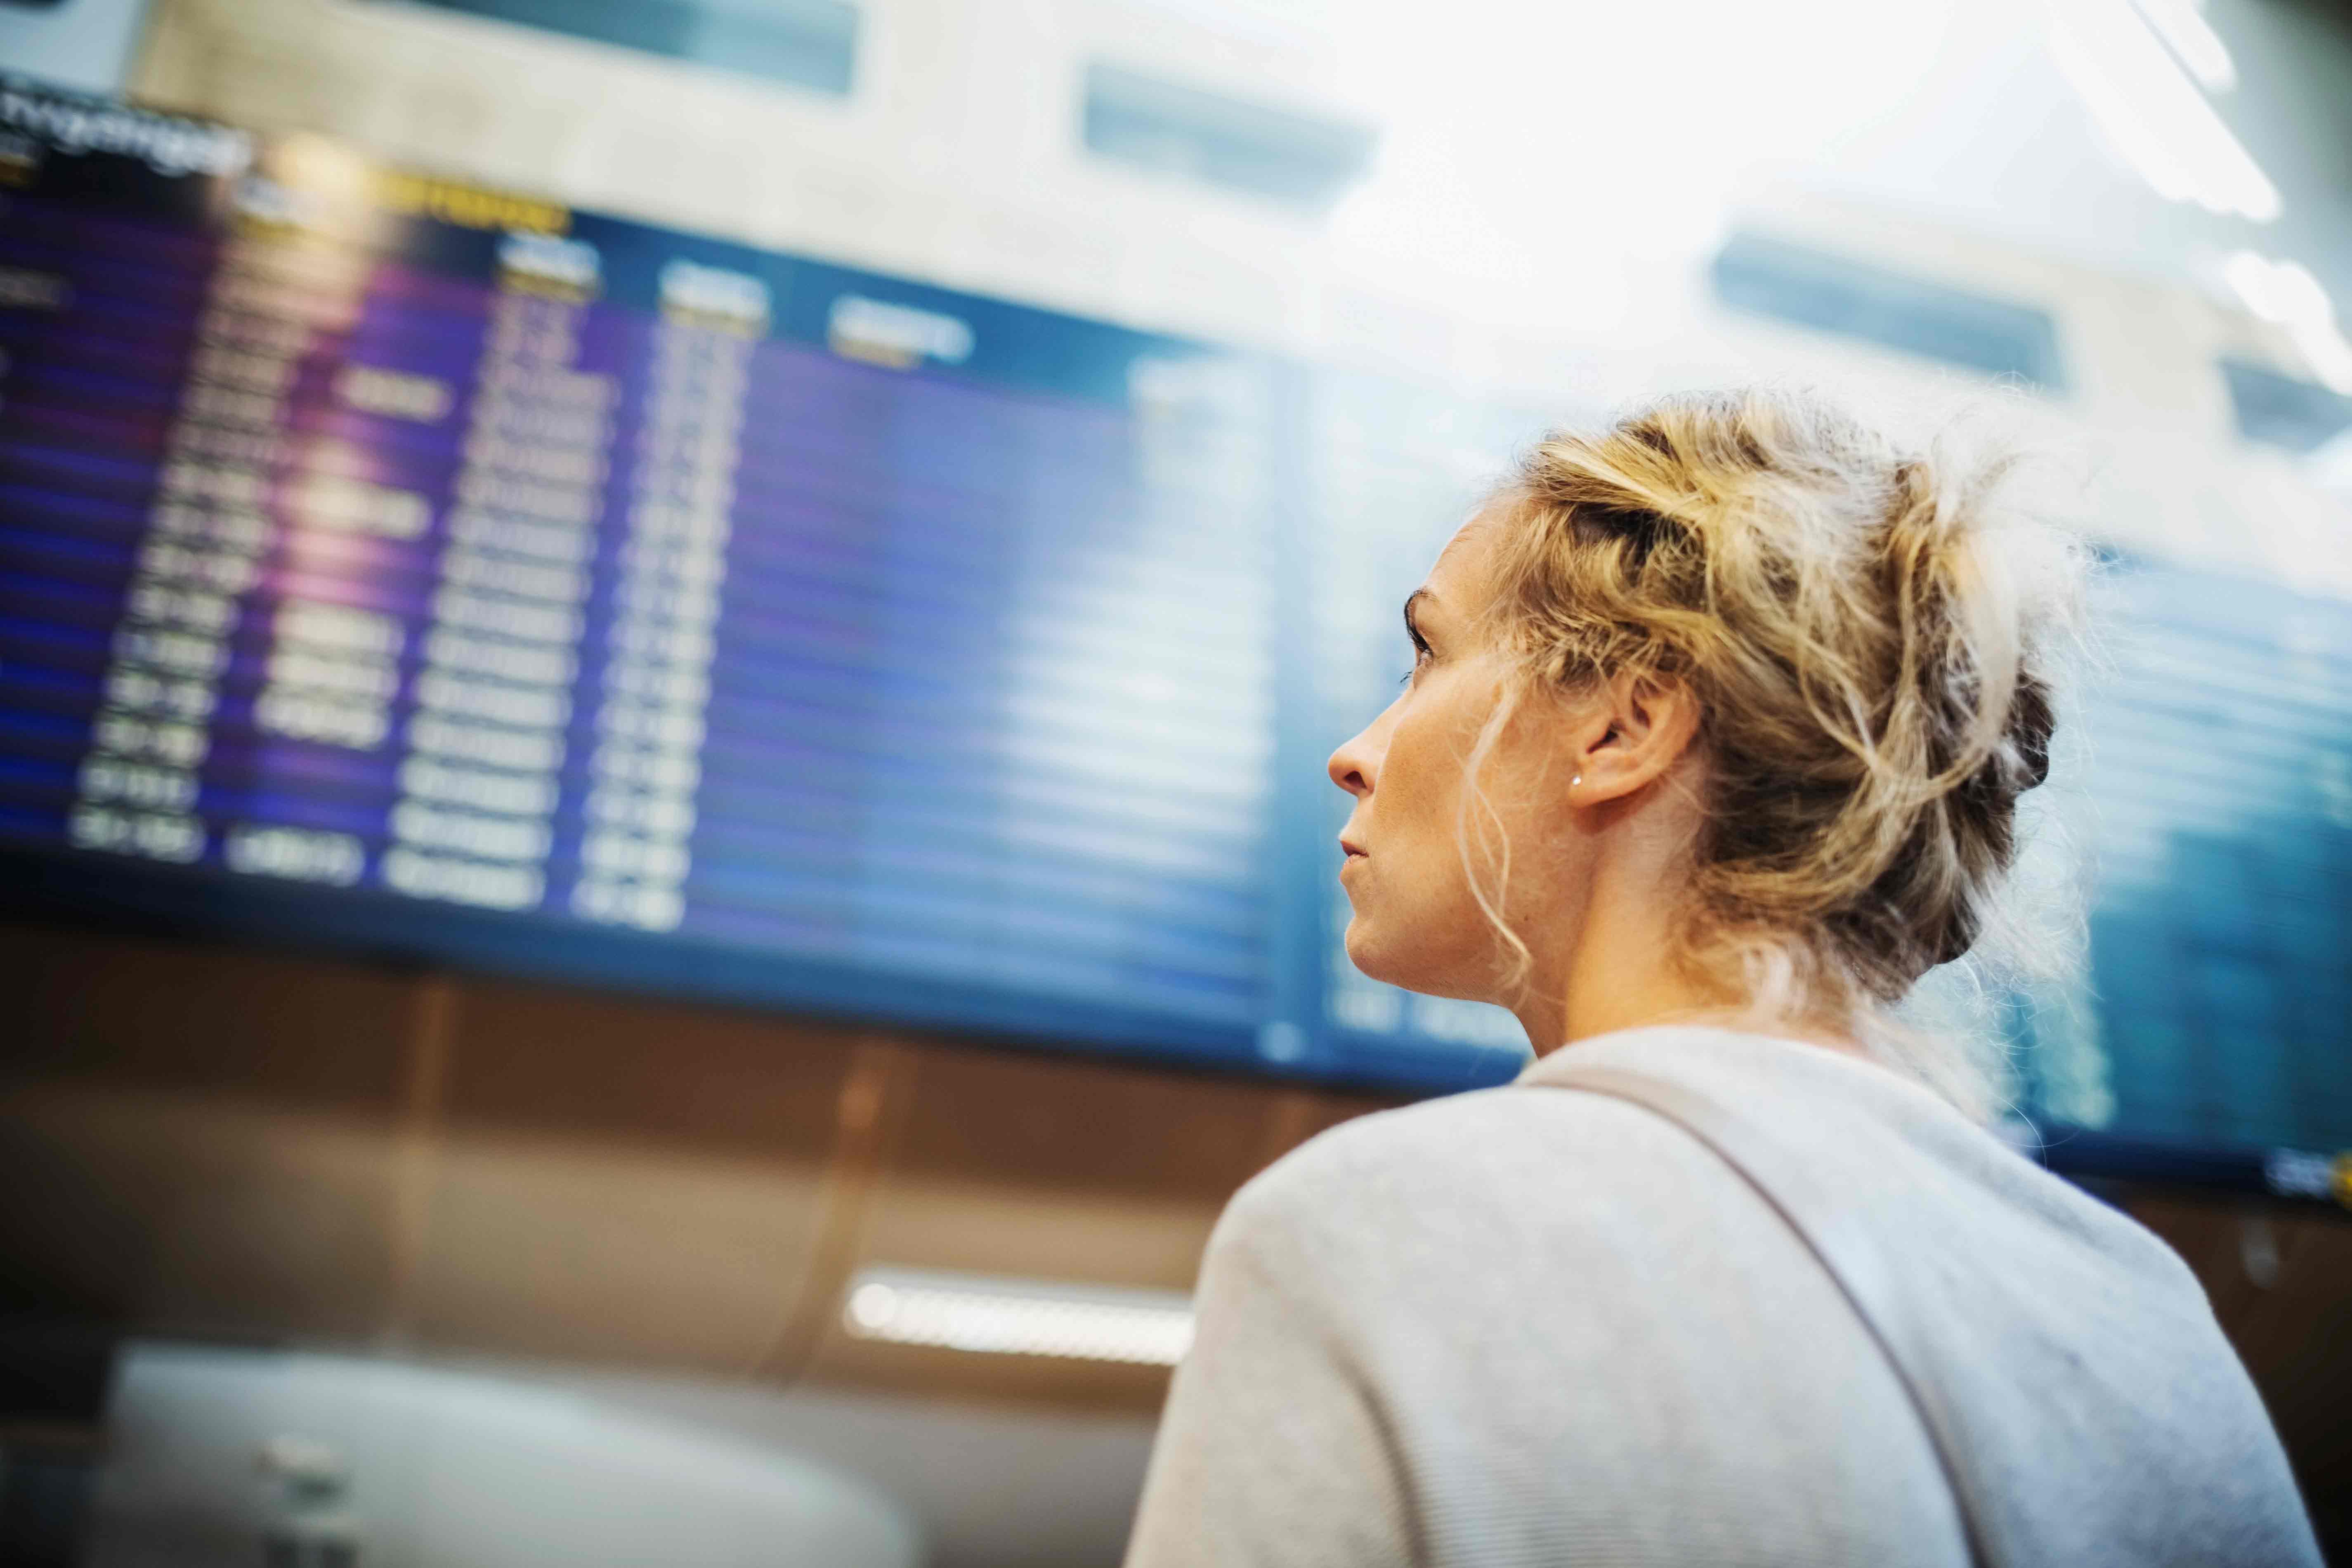 Portland travel startup raises $1.5M despite Covid-19 travel turmoil